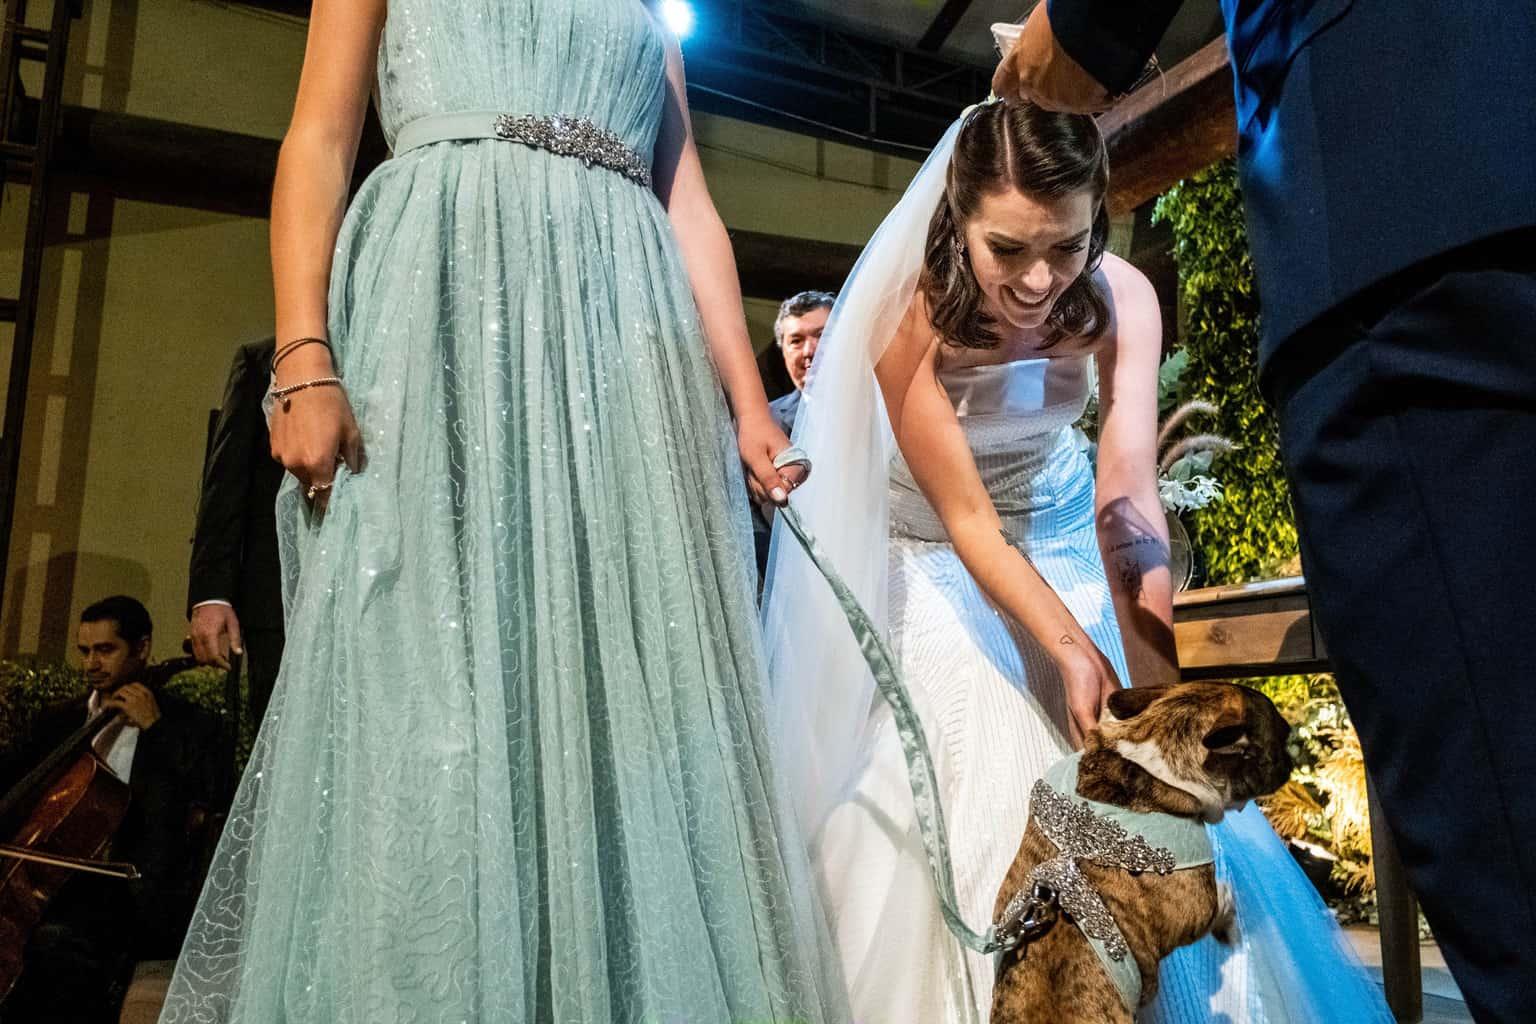 Bel-Benkler-eventos-Casamento-Ariane-e-Matheus-cerimonia-decoracao-contemporanea-fotografia-Rafael-Bigarelli-noivos-na-pista-Spazio-Giardini-45